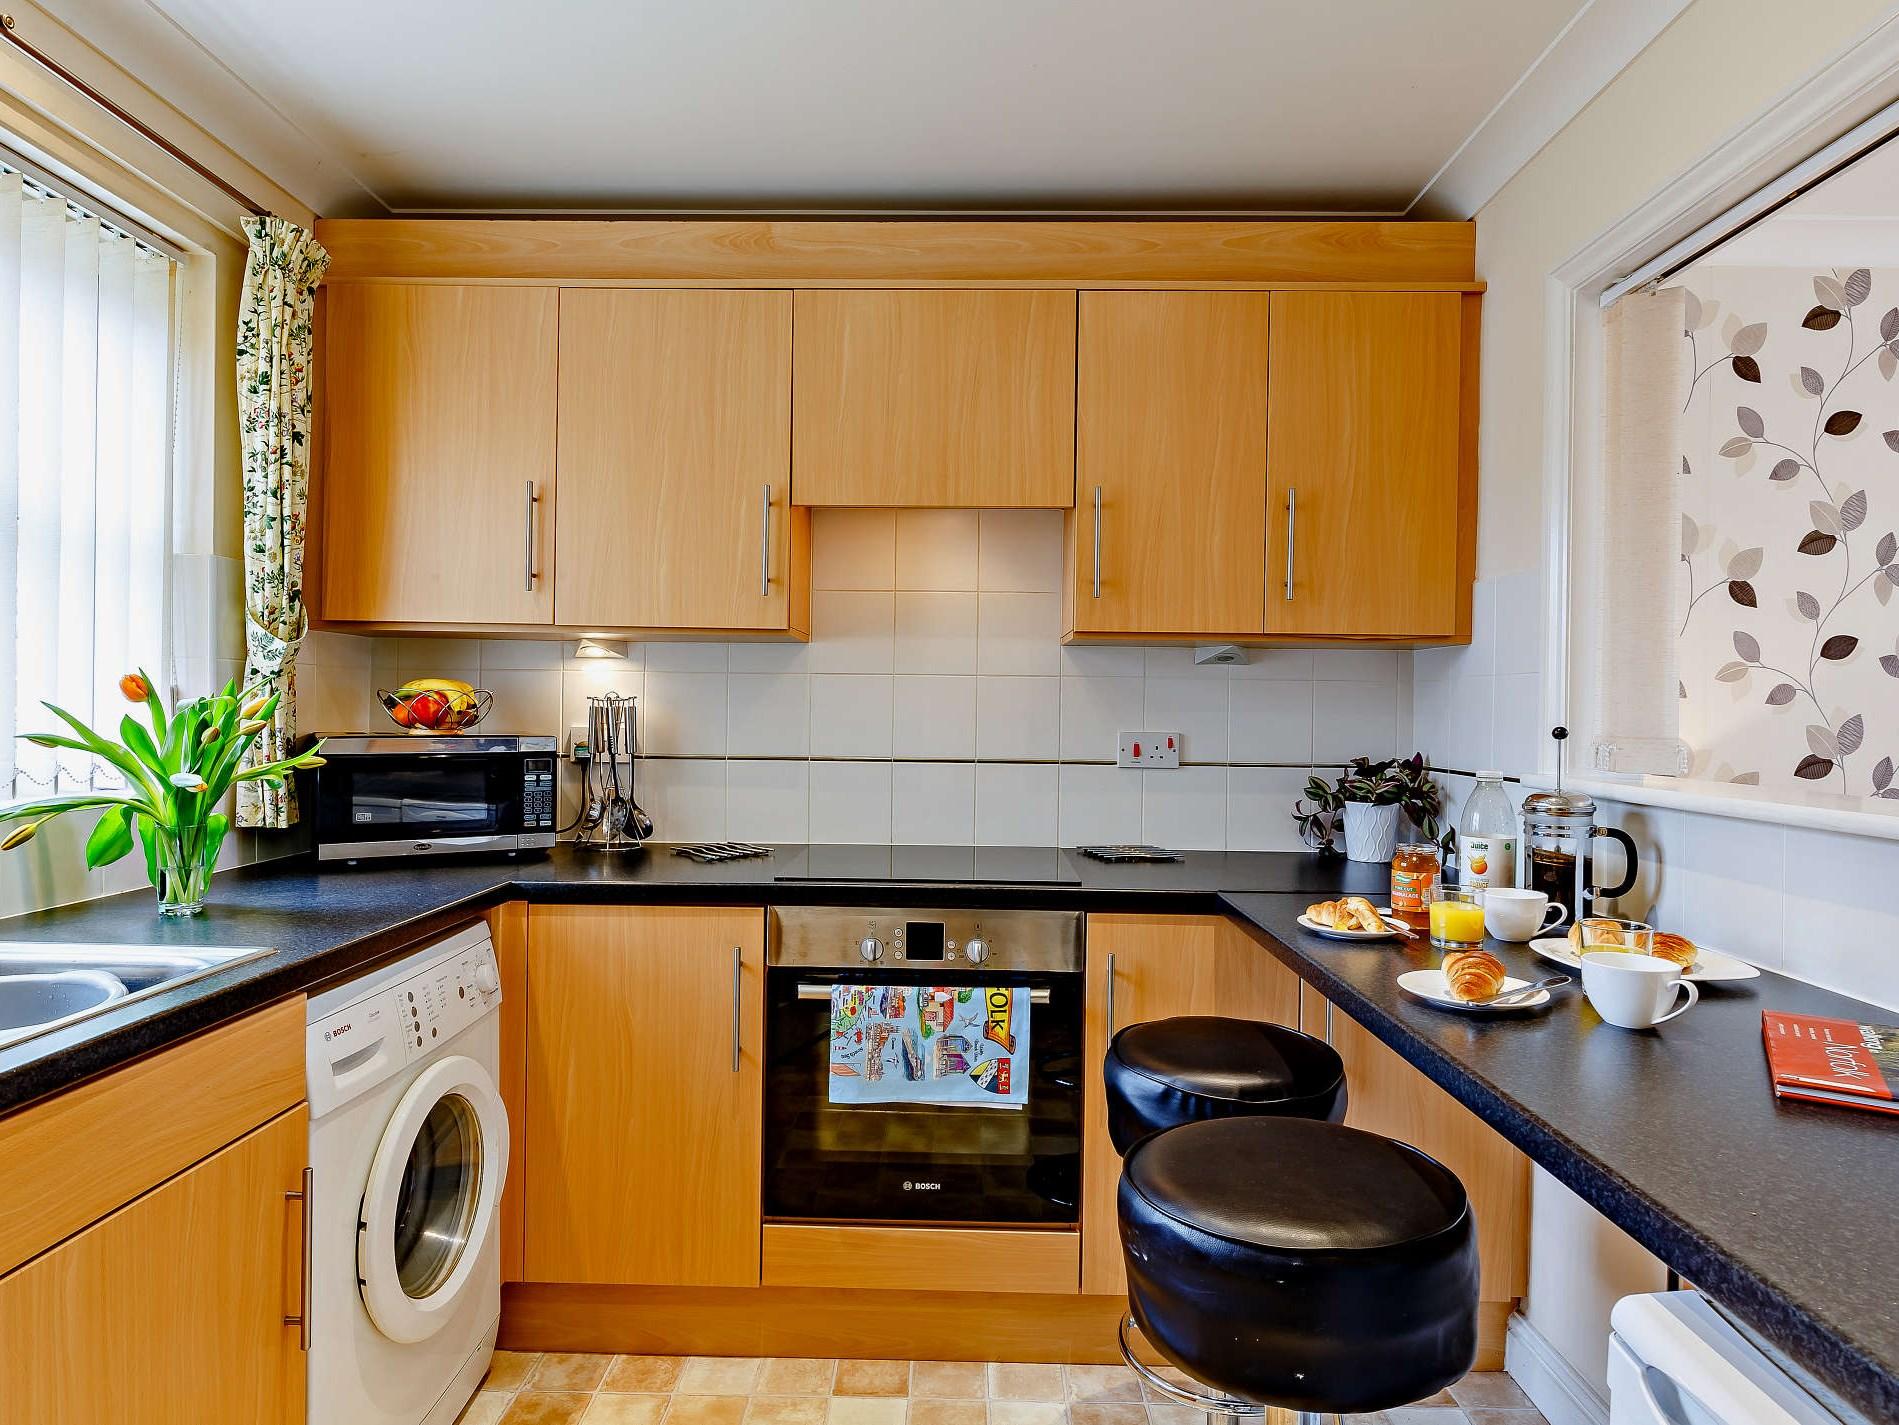 2 Bedroom House in Norfolk, East Anglia